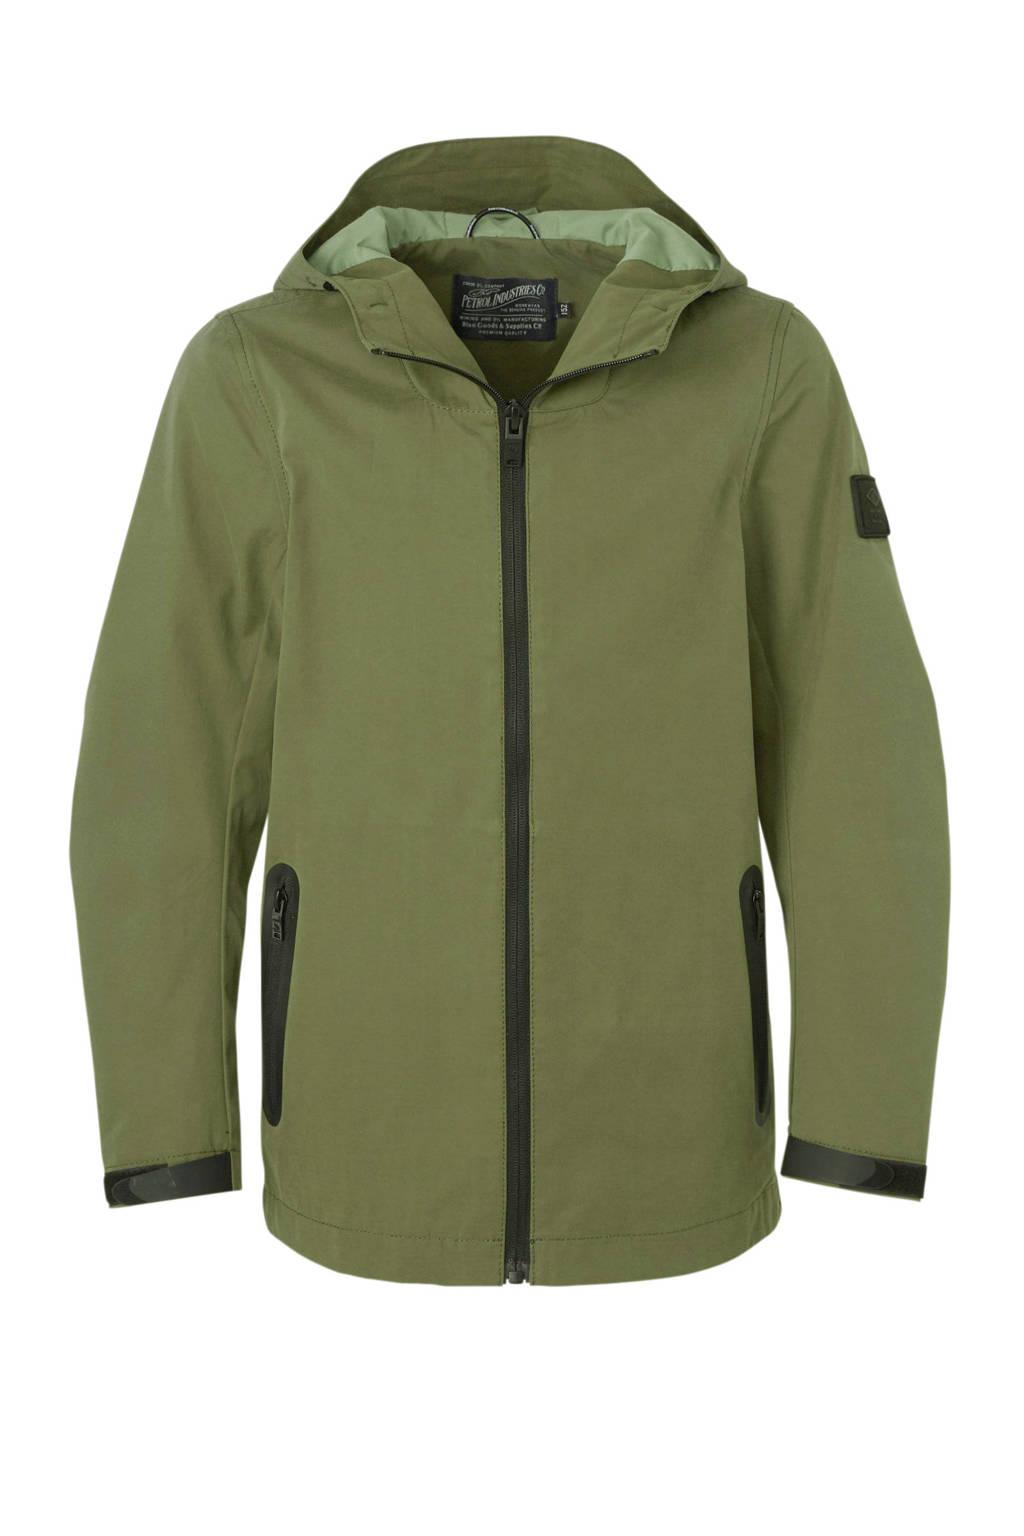 Petrol Industries zomerjas army groen/zwart, Army groen/zwart